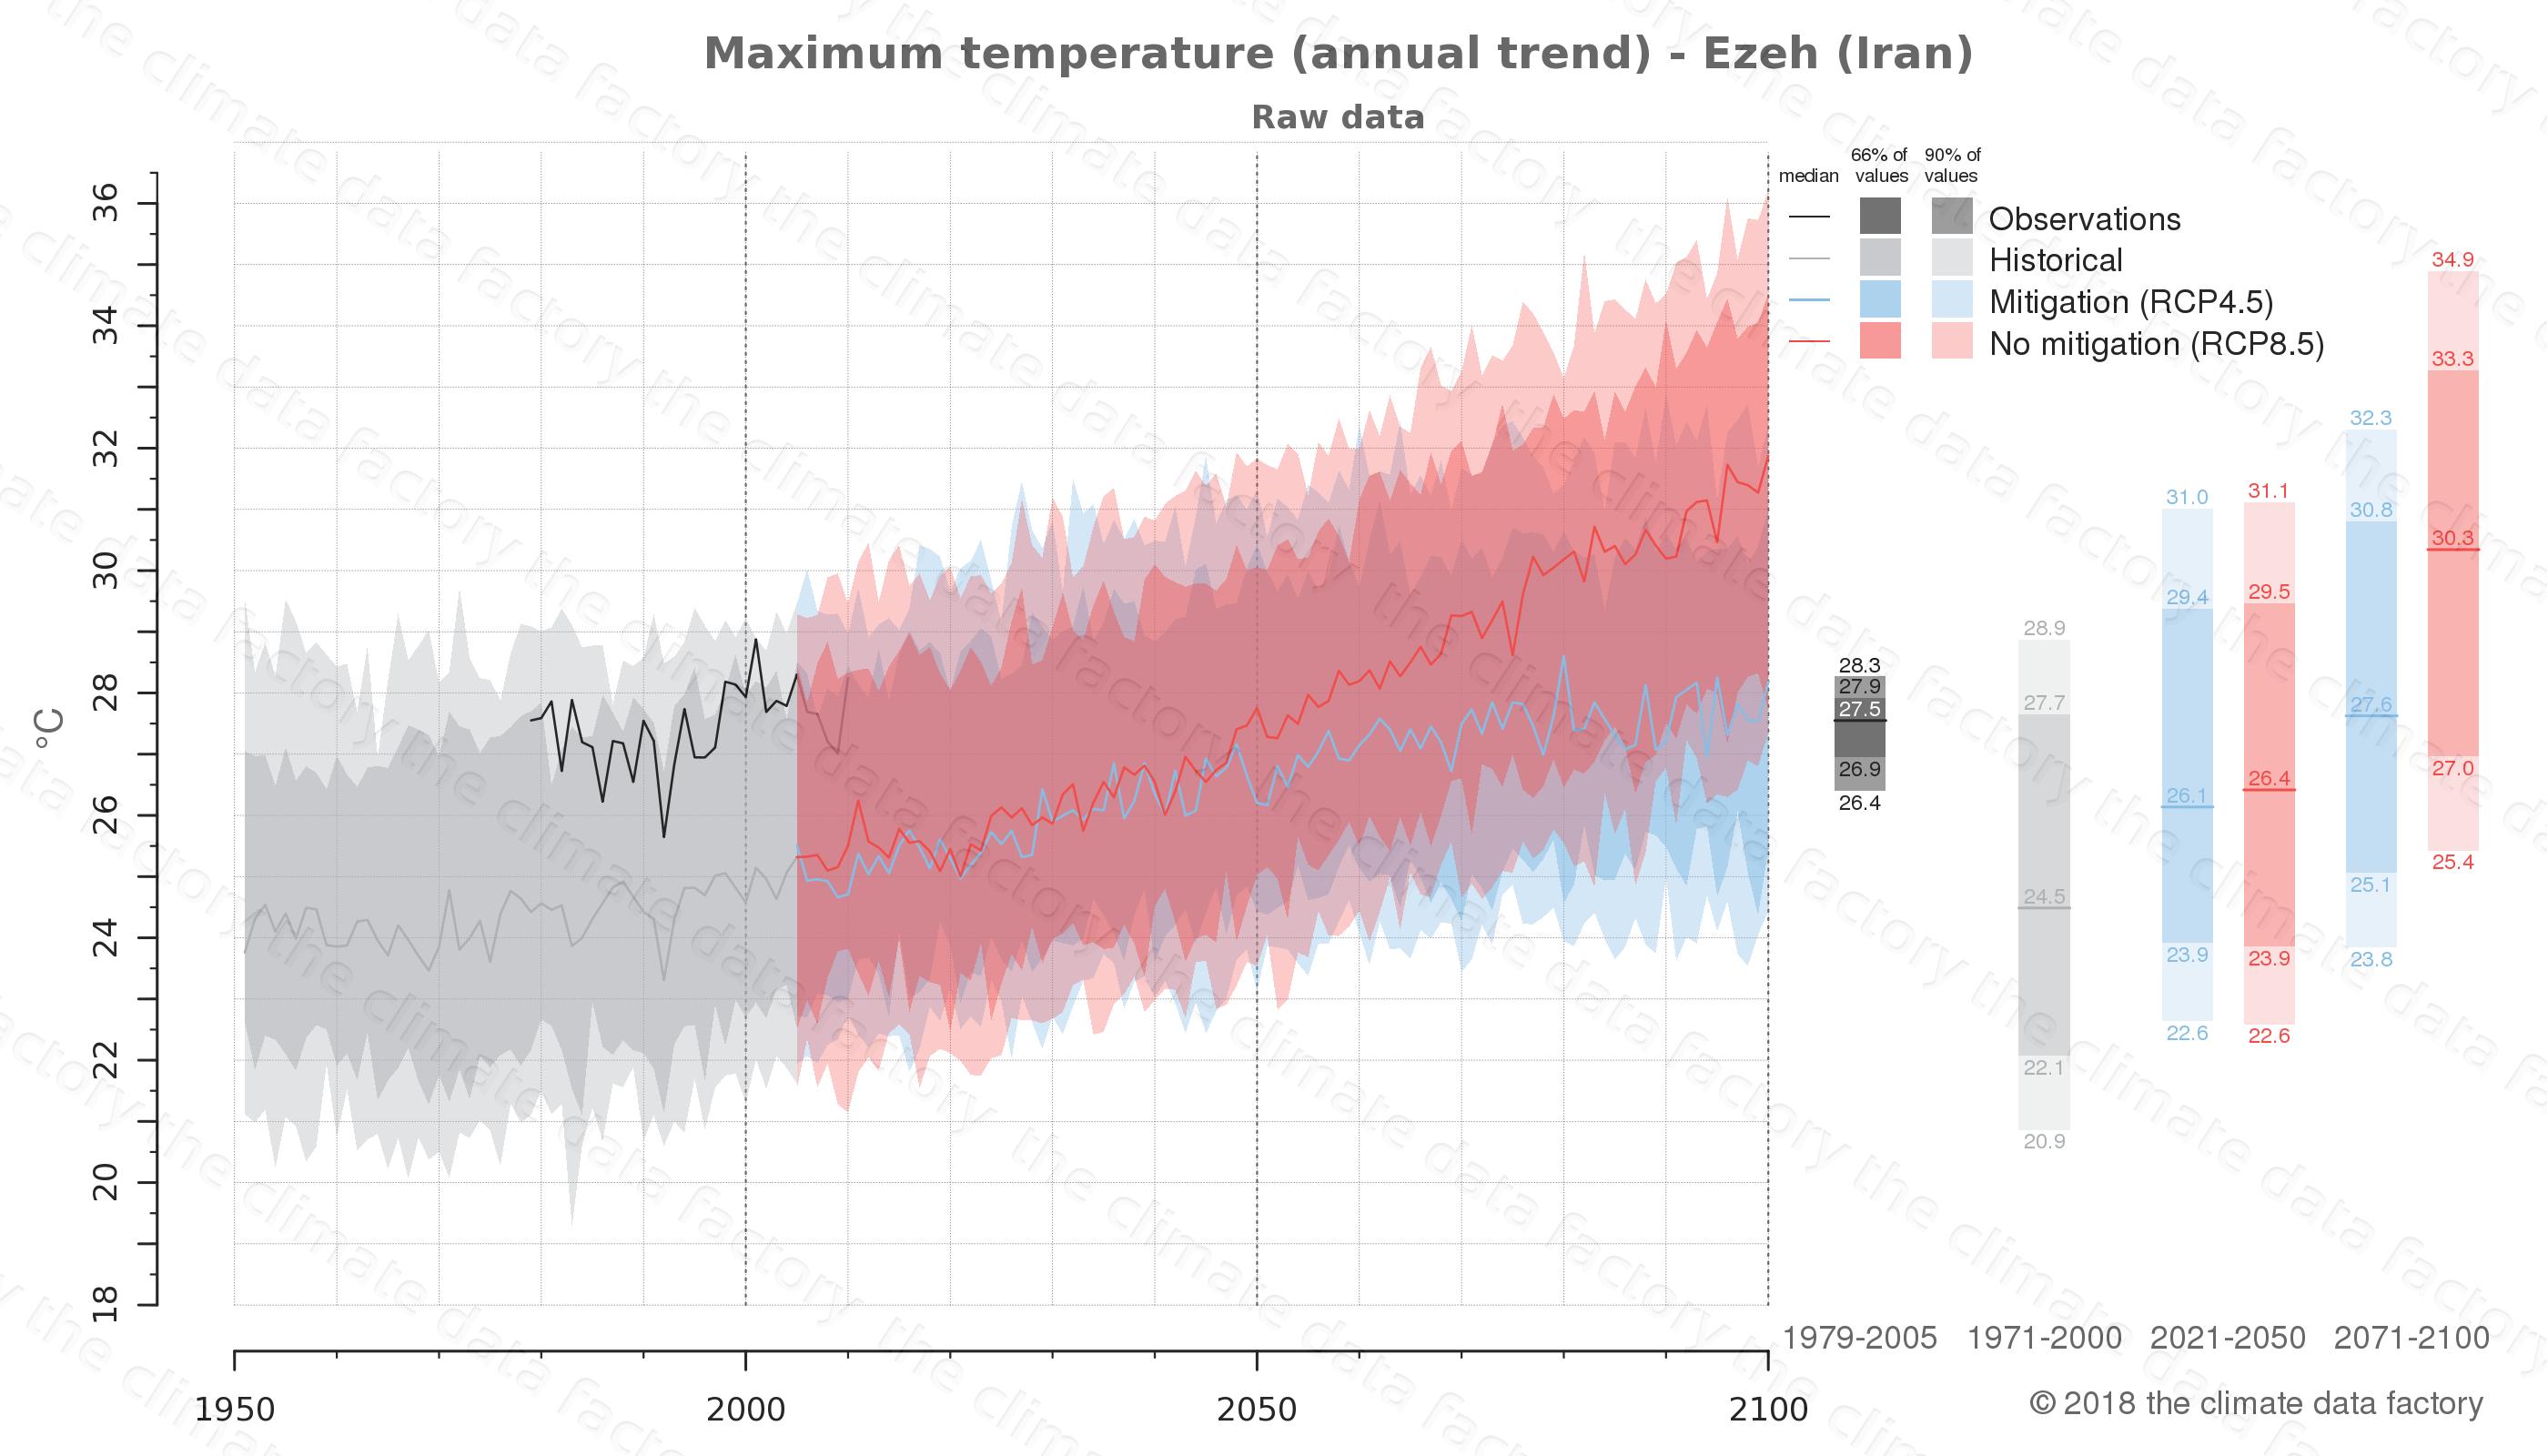 climate change data policy adaptation climate graph city data maximum-temperature ezeh iran